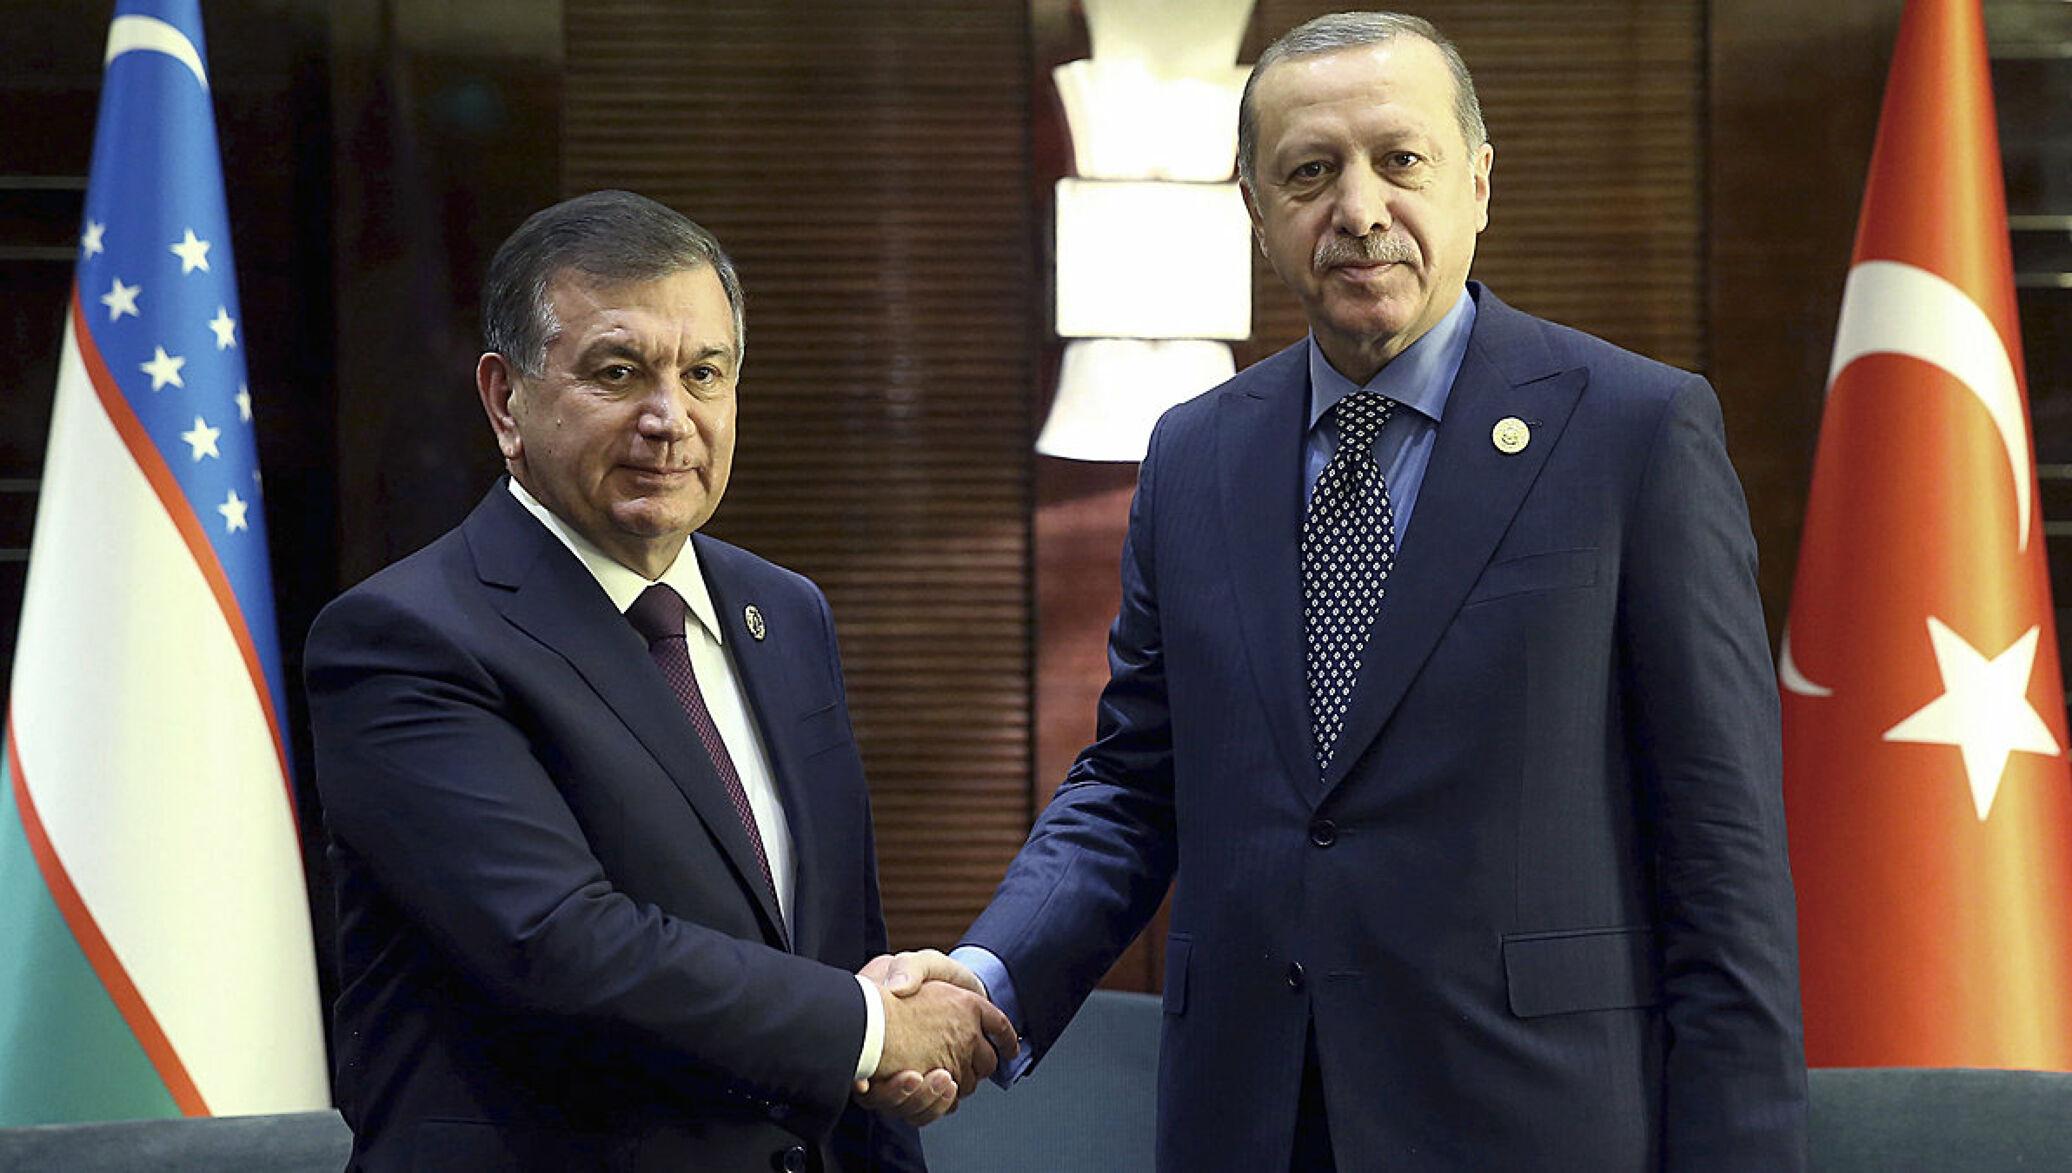 Президент Турции поздравил Шавката Мирзиёева и народ Узбекистана с 30-летием Независимости